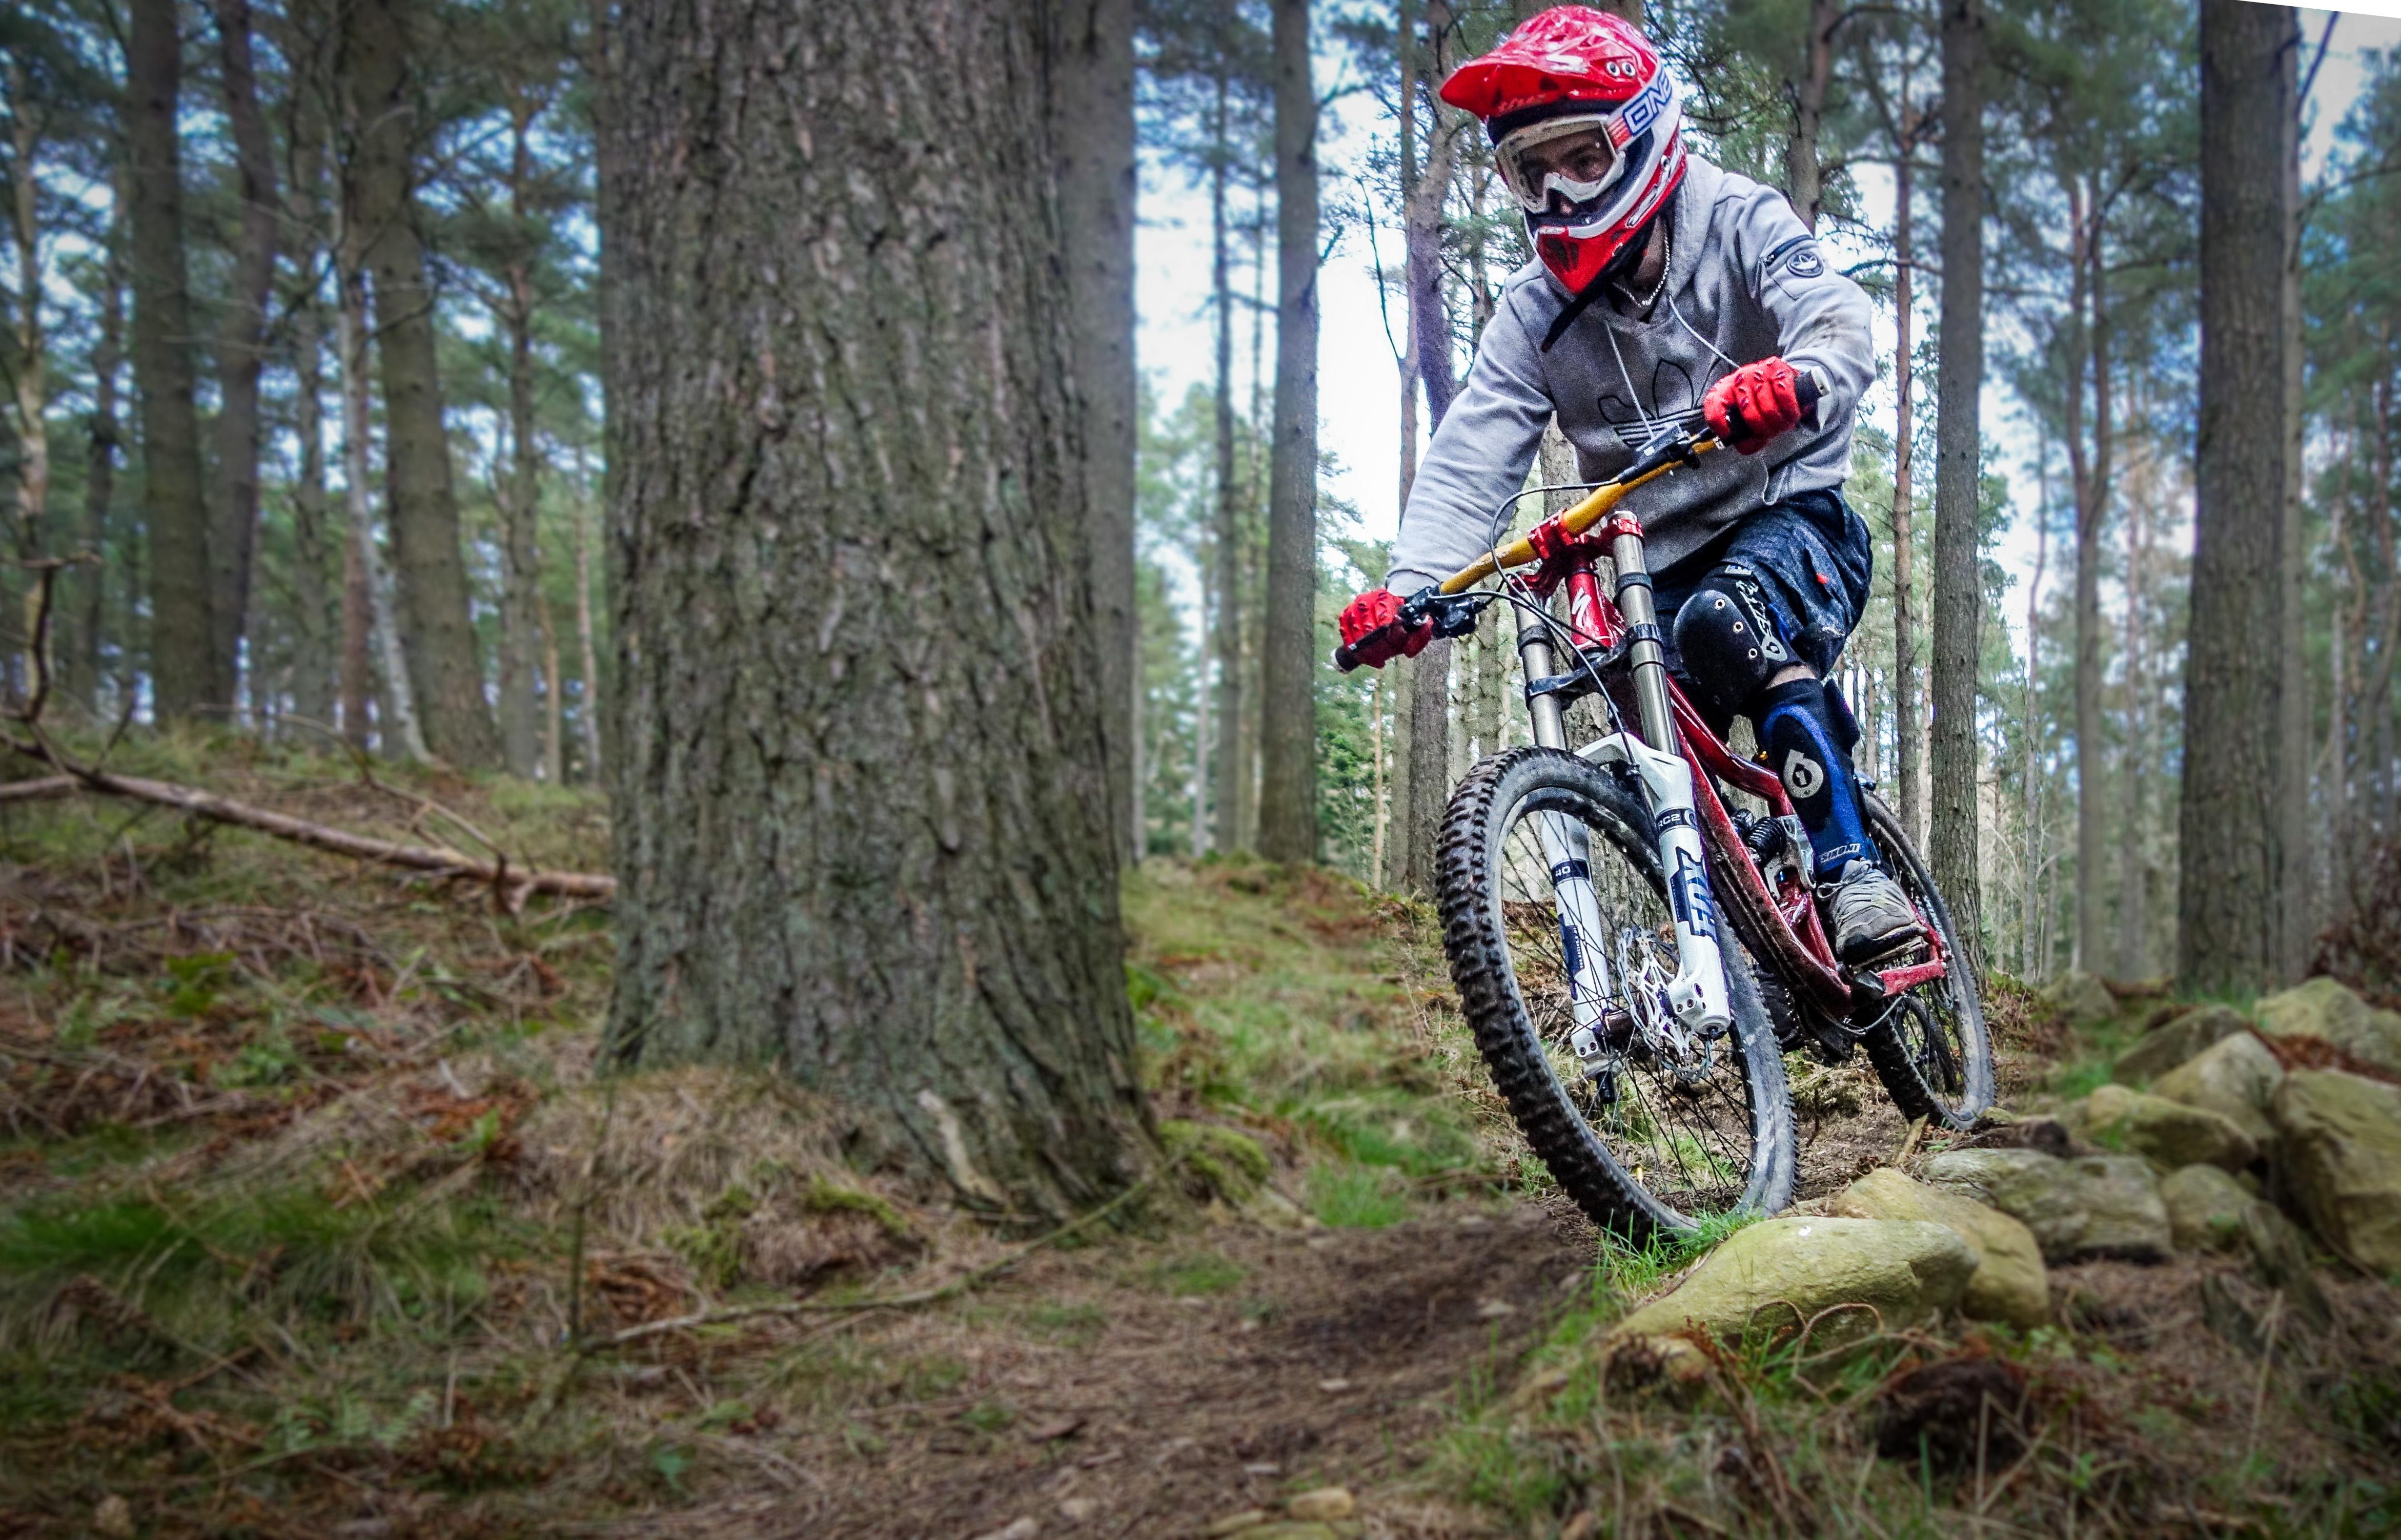 Sepeda Gunung Downhill Extreme - Arena Modifikasi